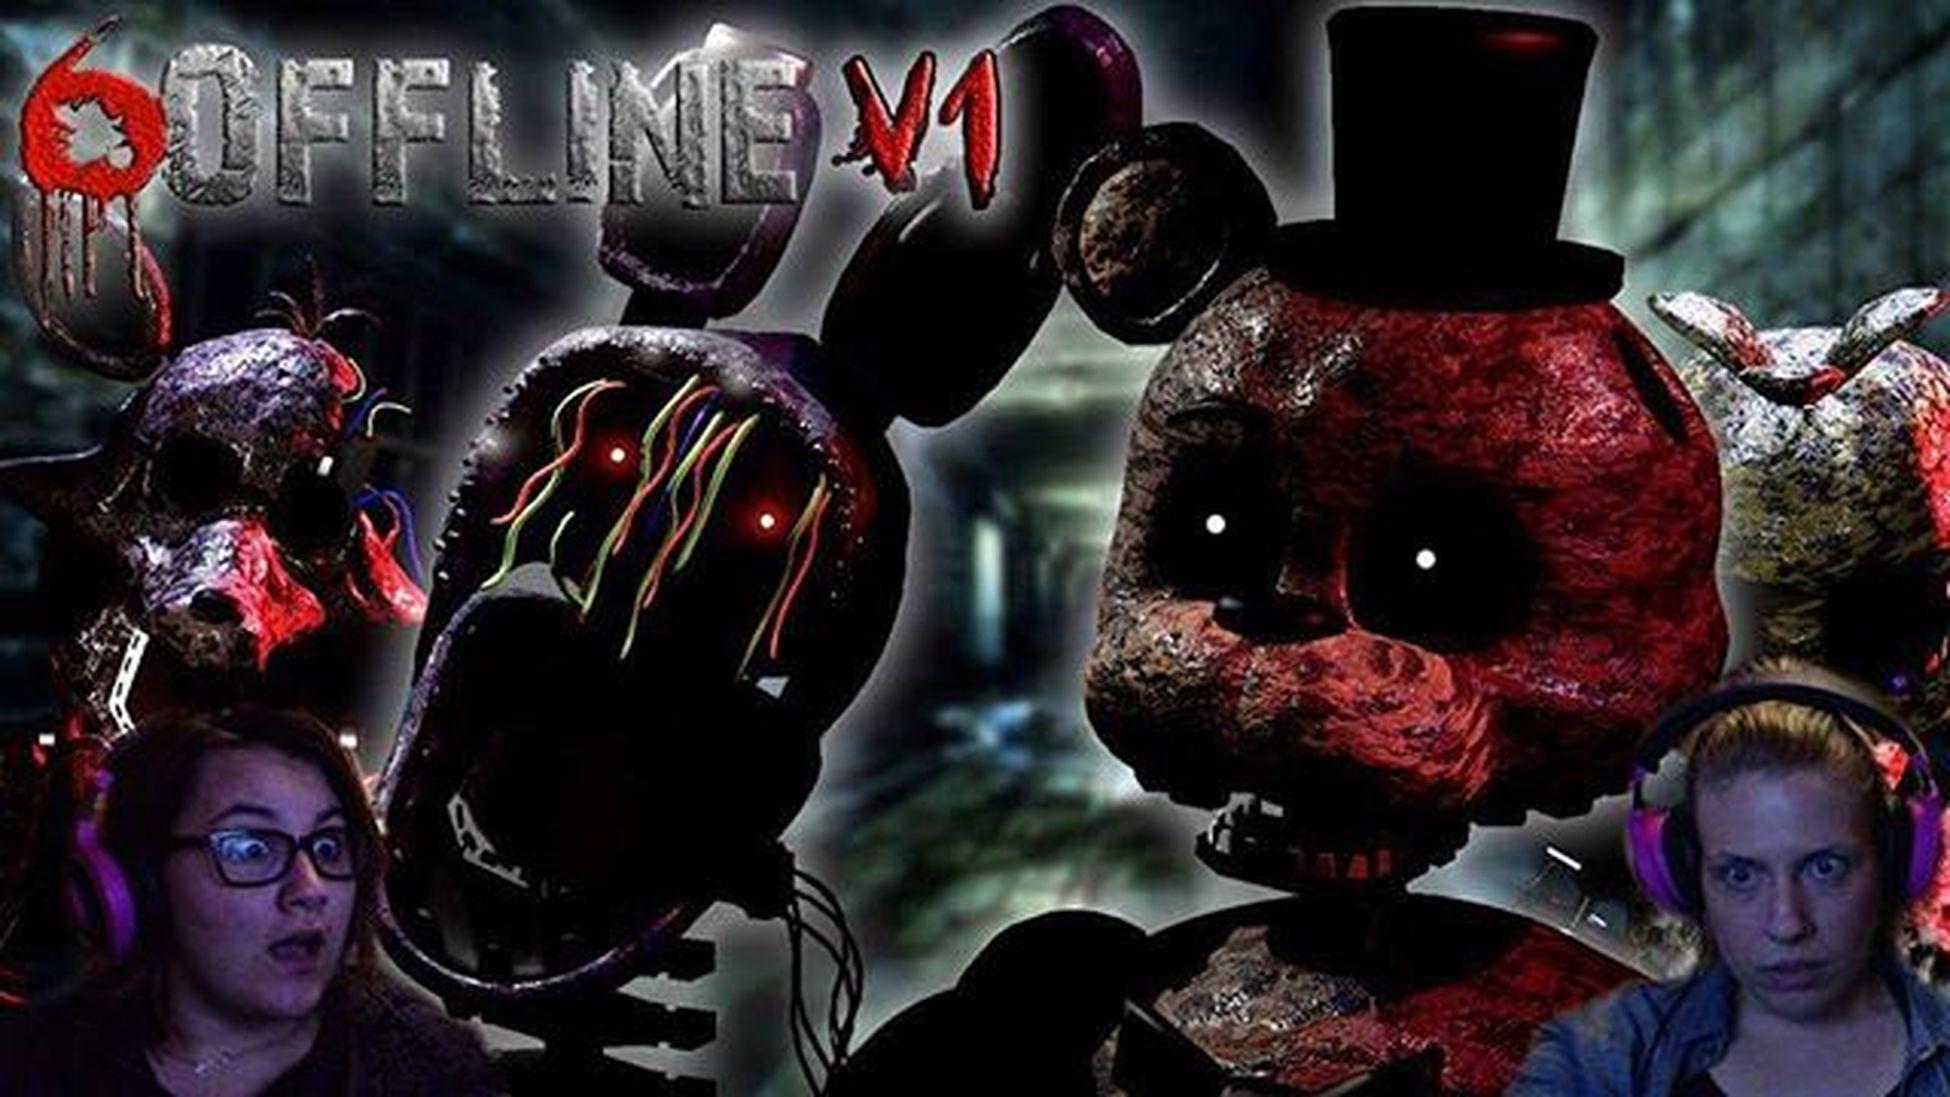 Horror_night 18 V1 The_joy_of_creation_reborn 😂